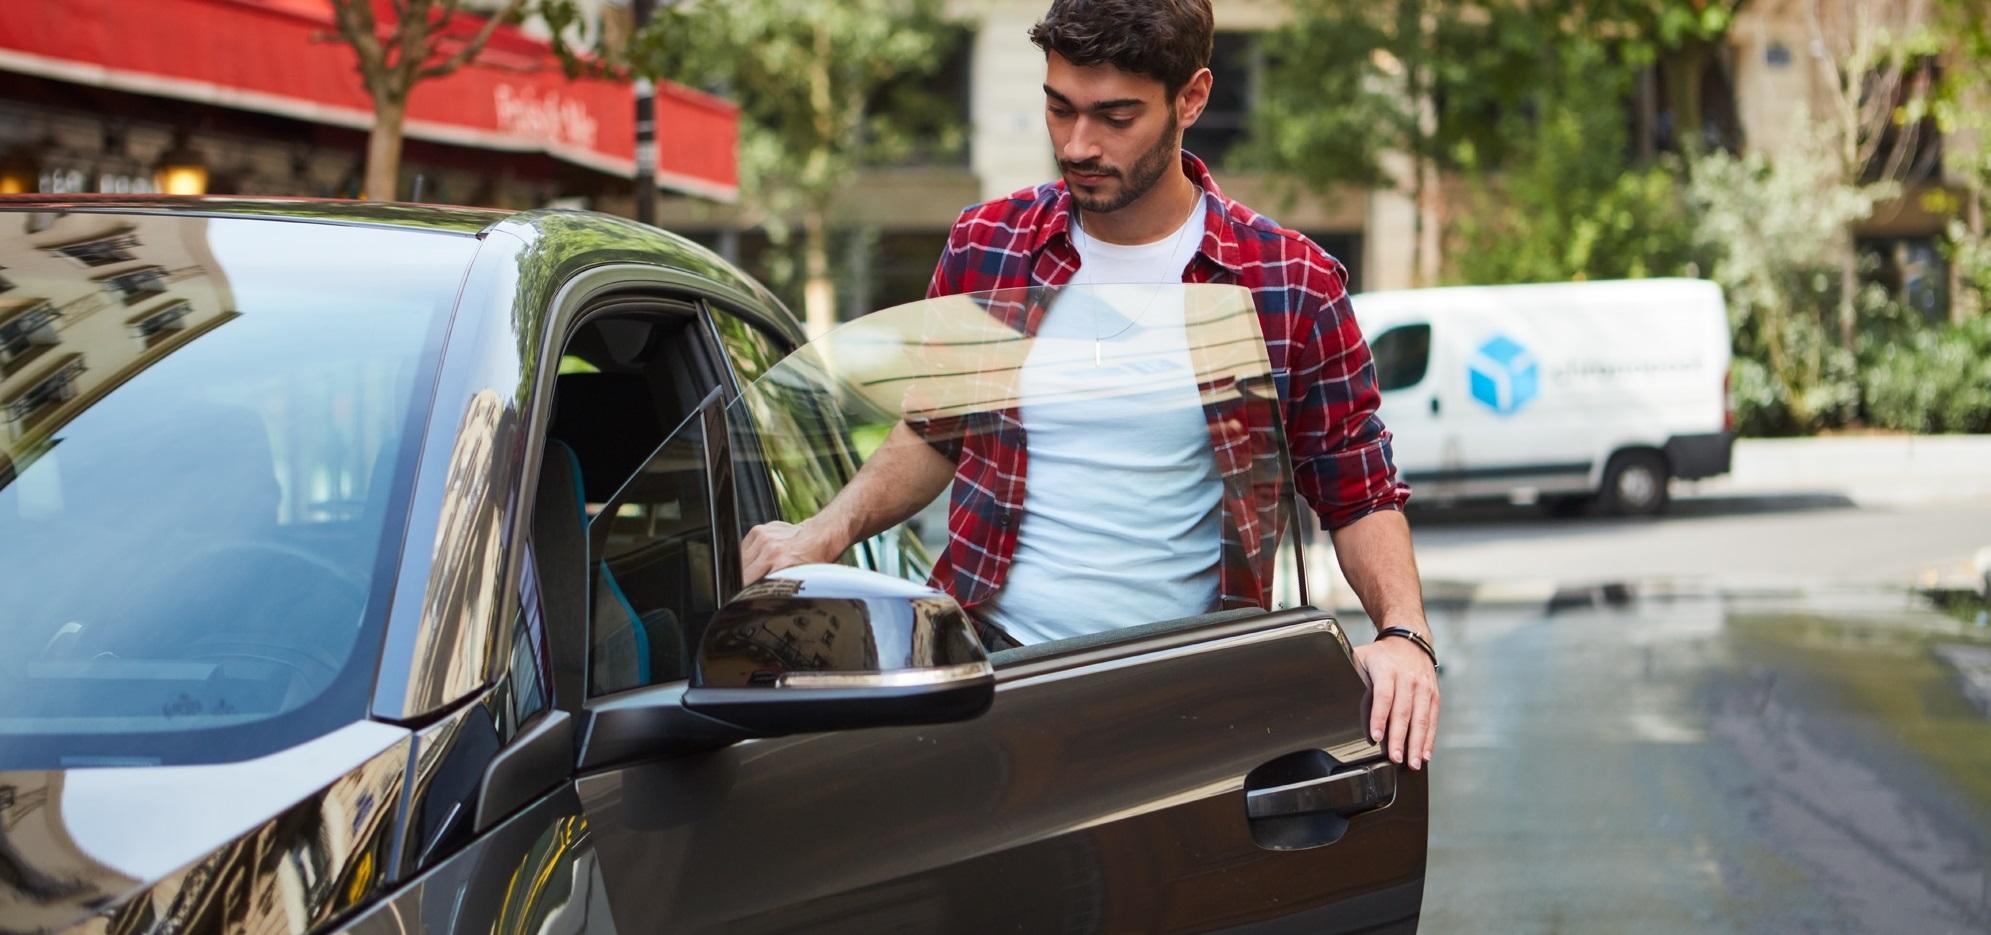 BlaBlaCar in Kooperation mit Axa